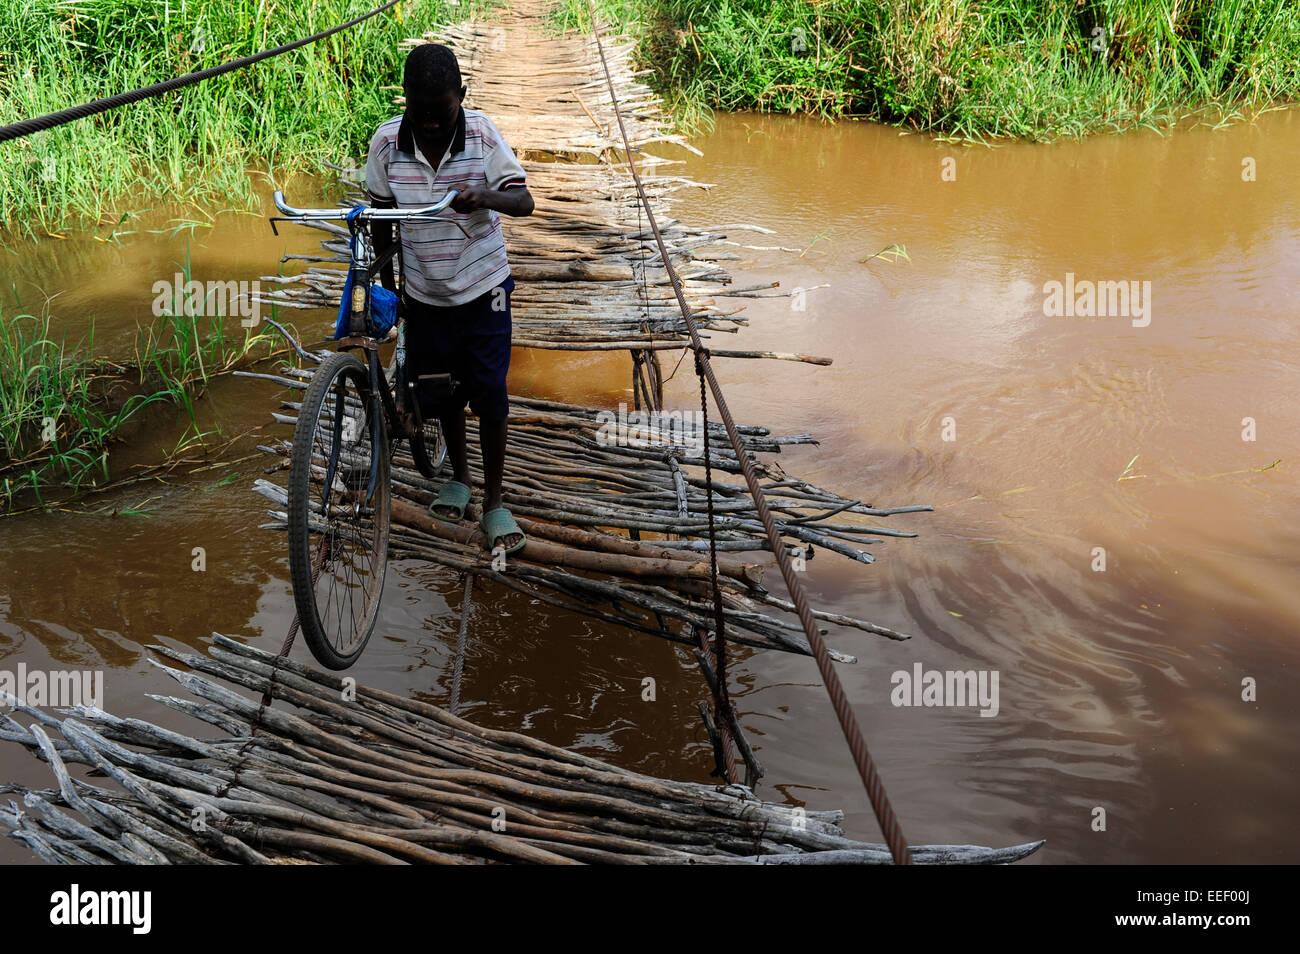 TANZANIA, Korogwe, puente colgante en Kwalukonge / TANSANIA, Korogwe, en Kwalukonge Haengebruecke Imagen De Stock